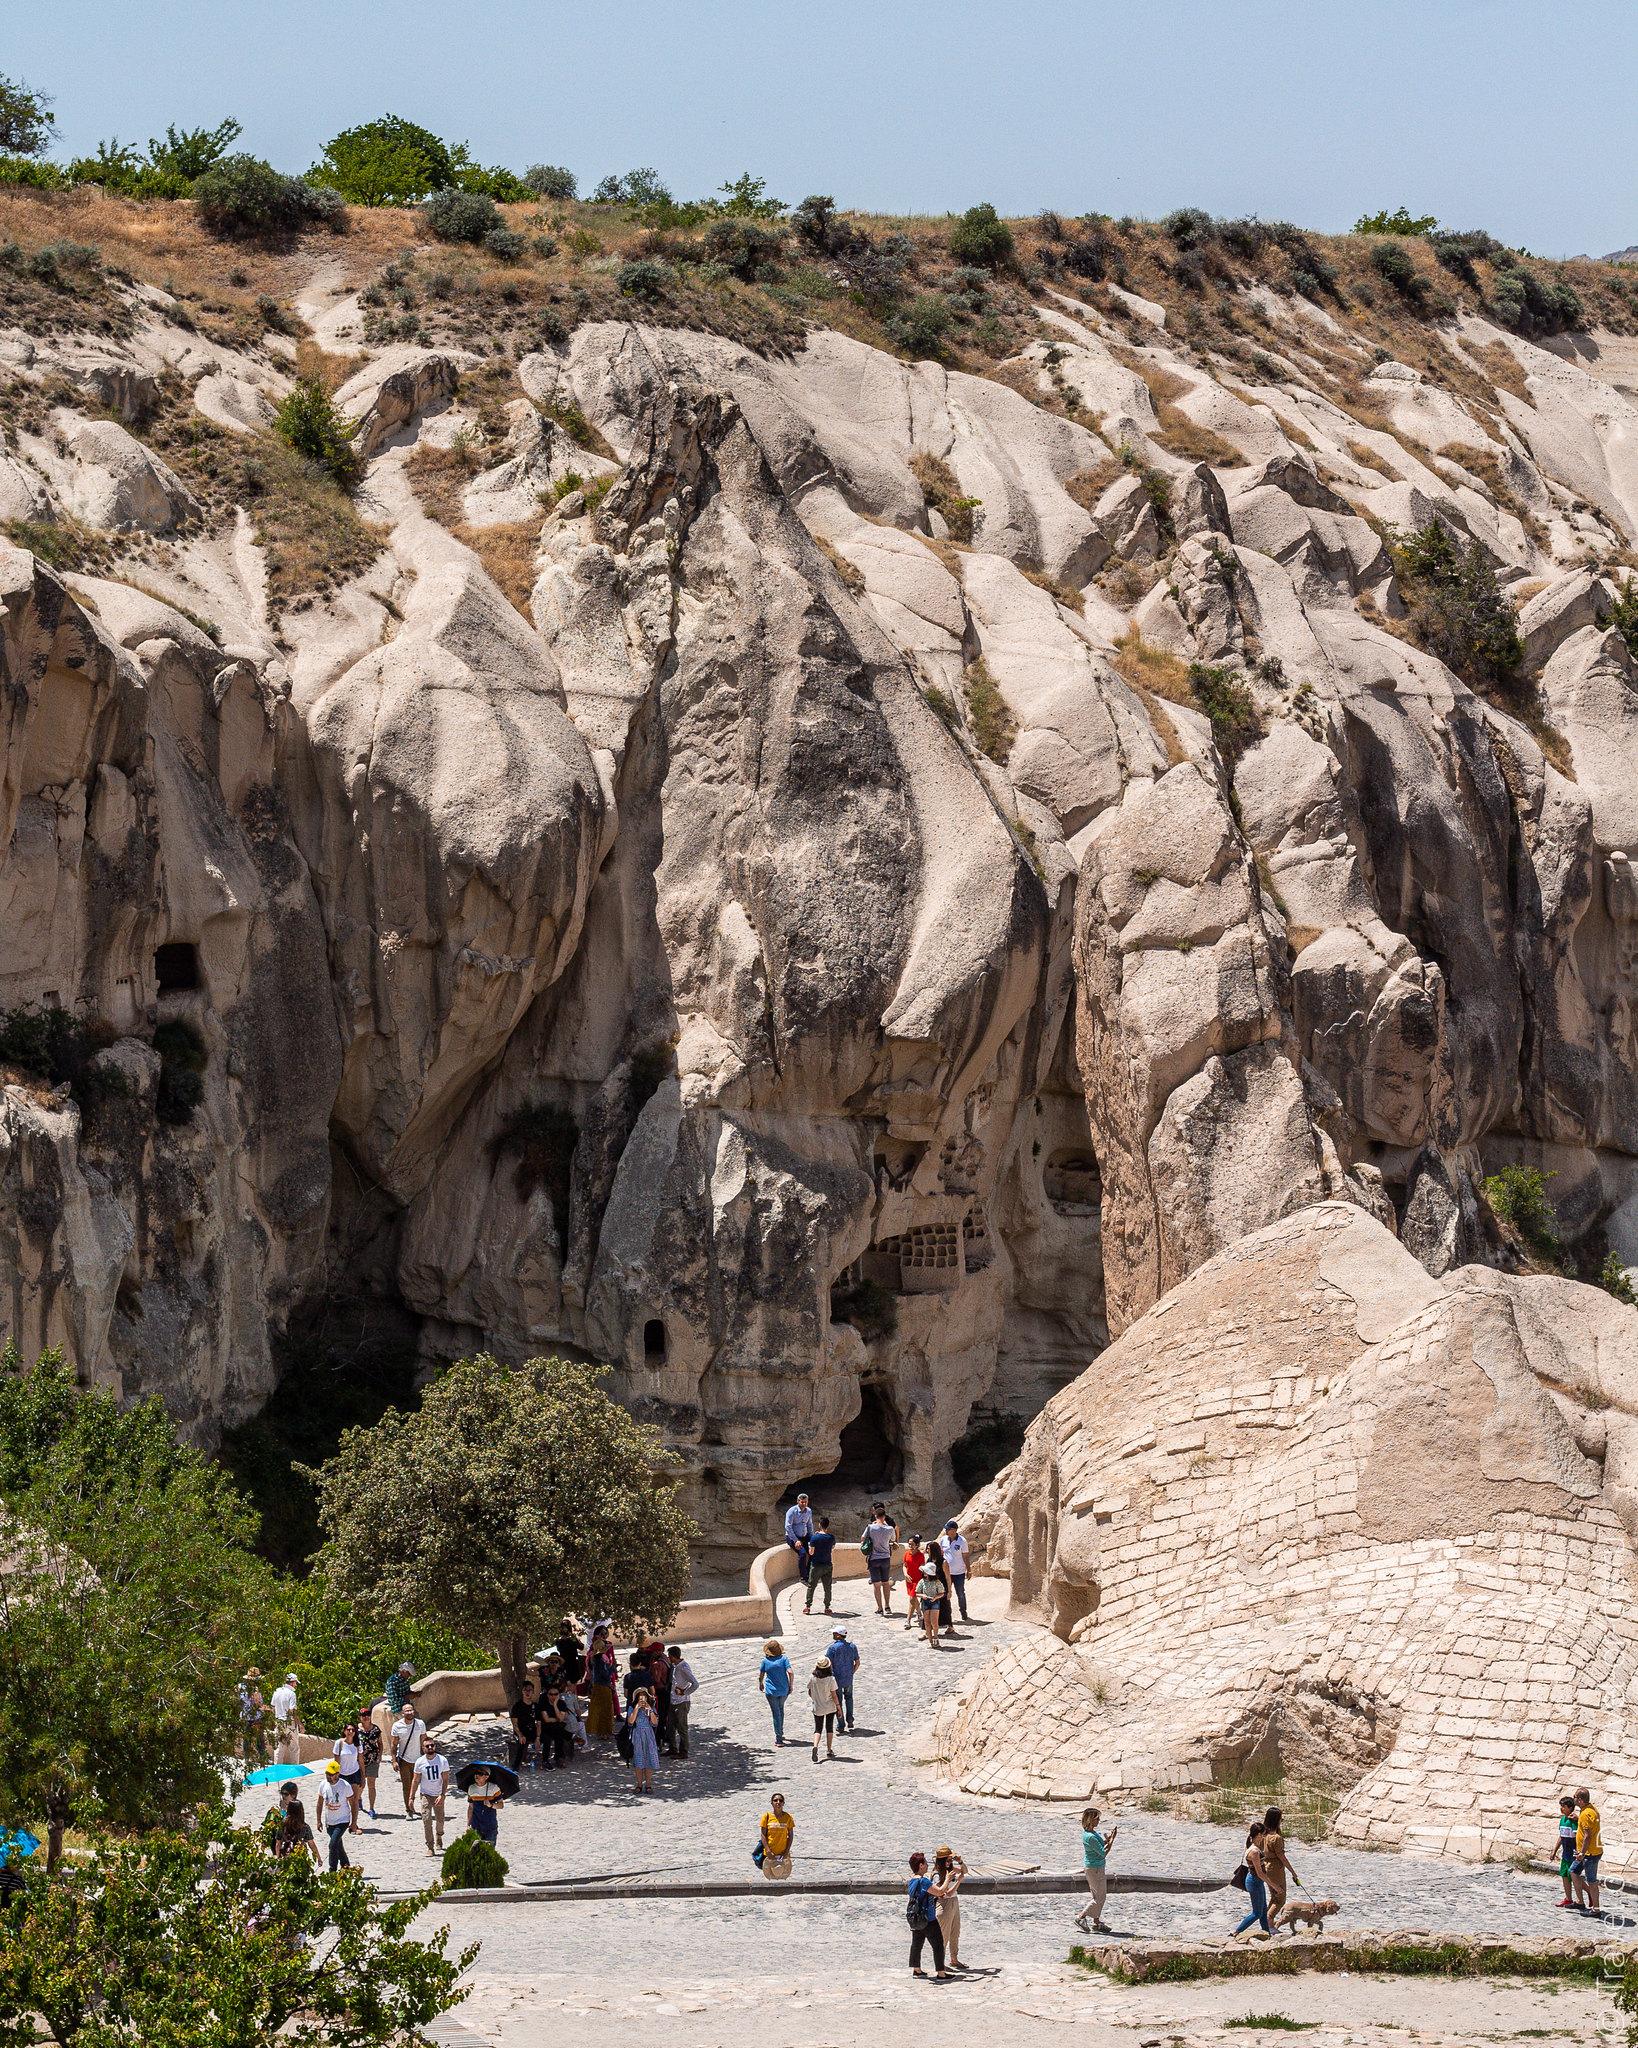 Goreme-National-Park-Cappadocia-6021